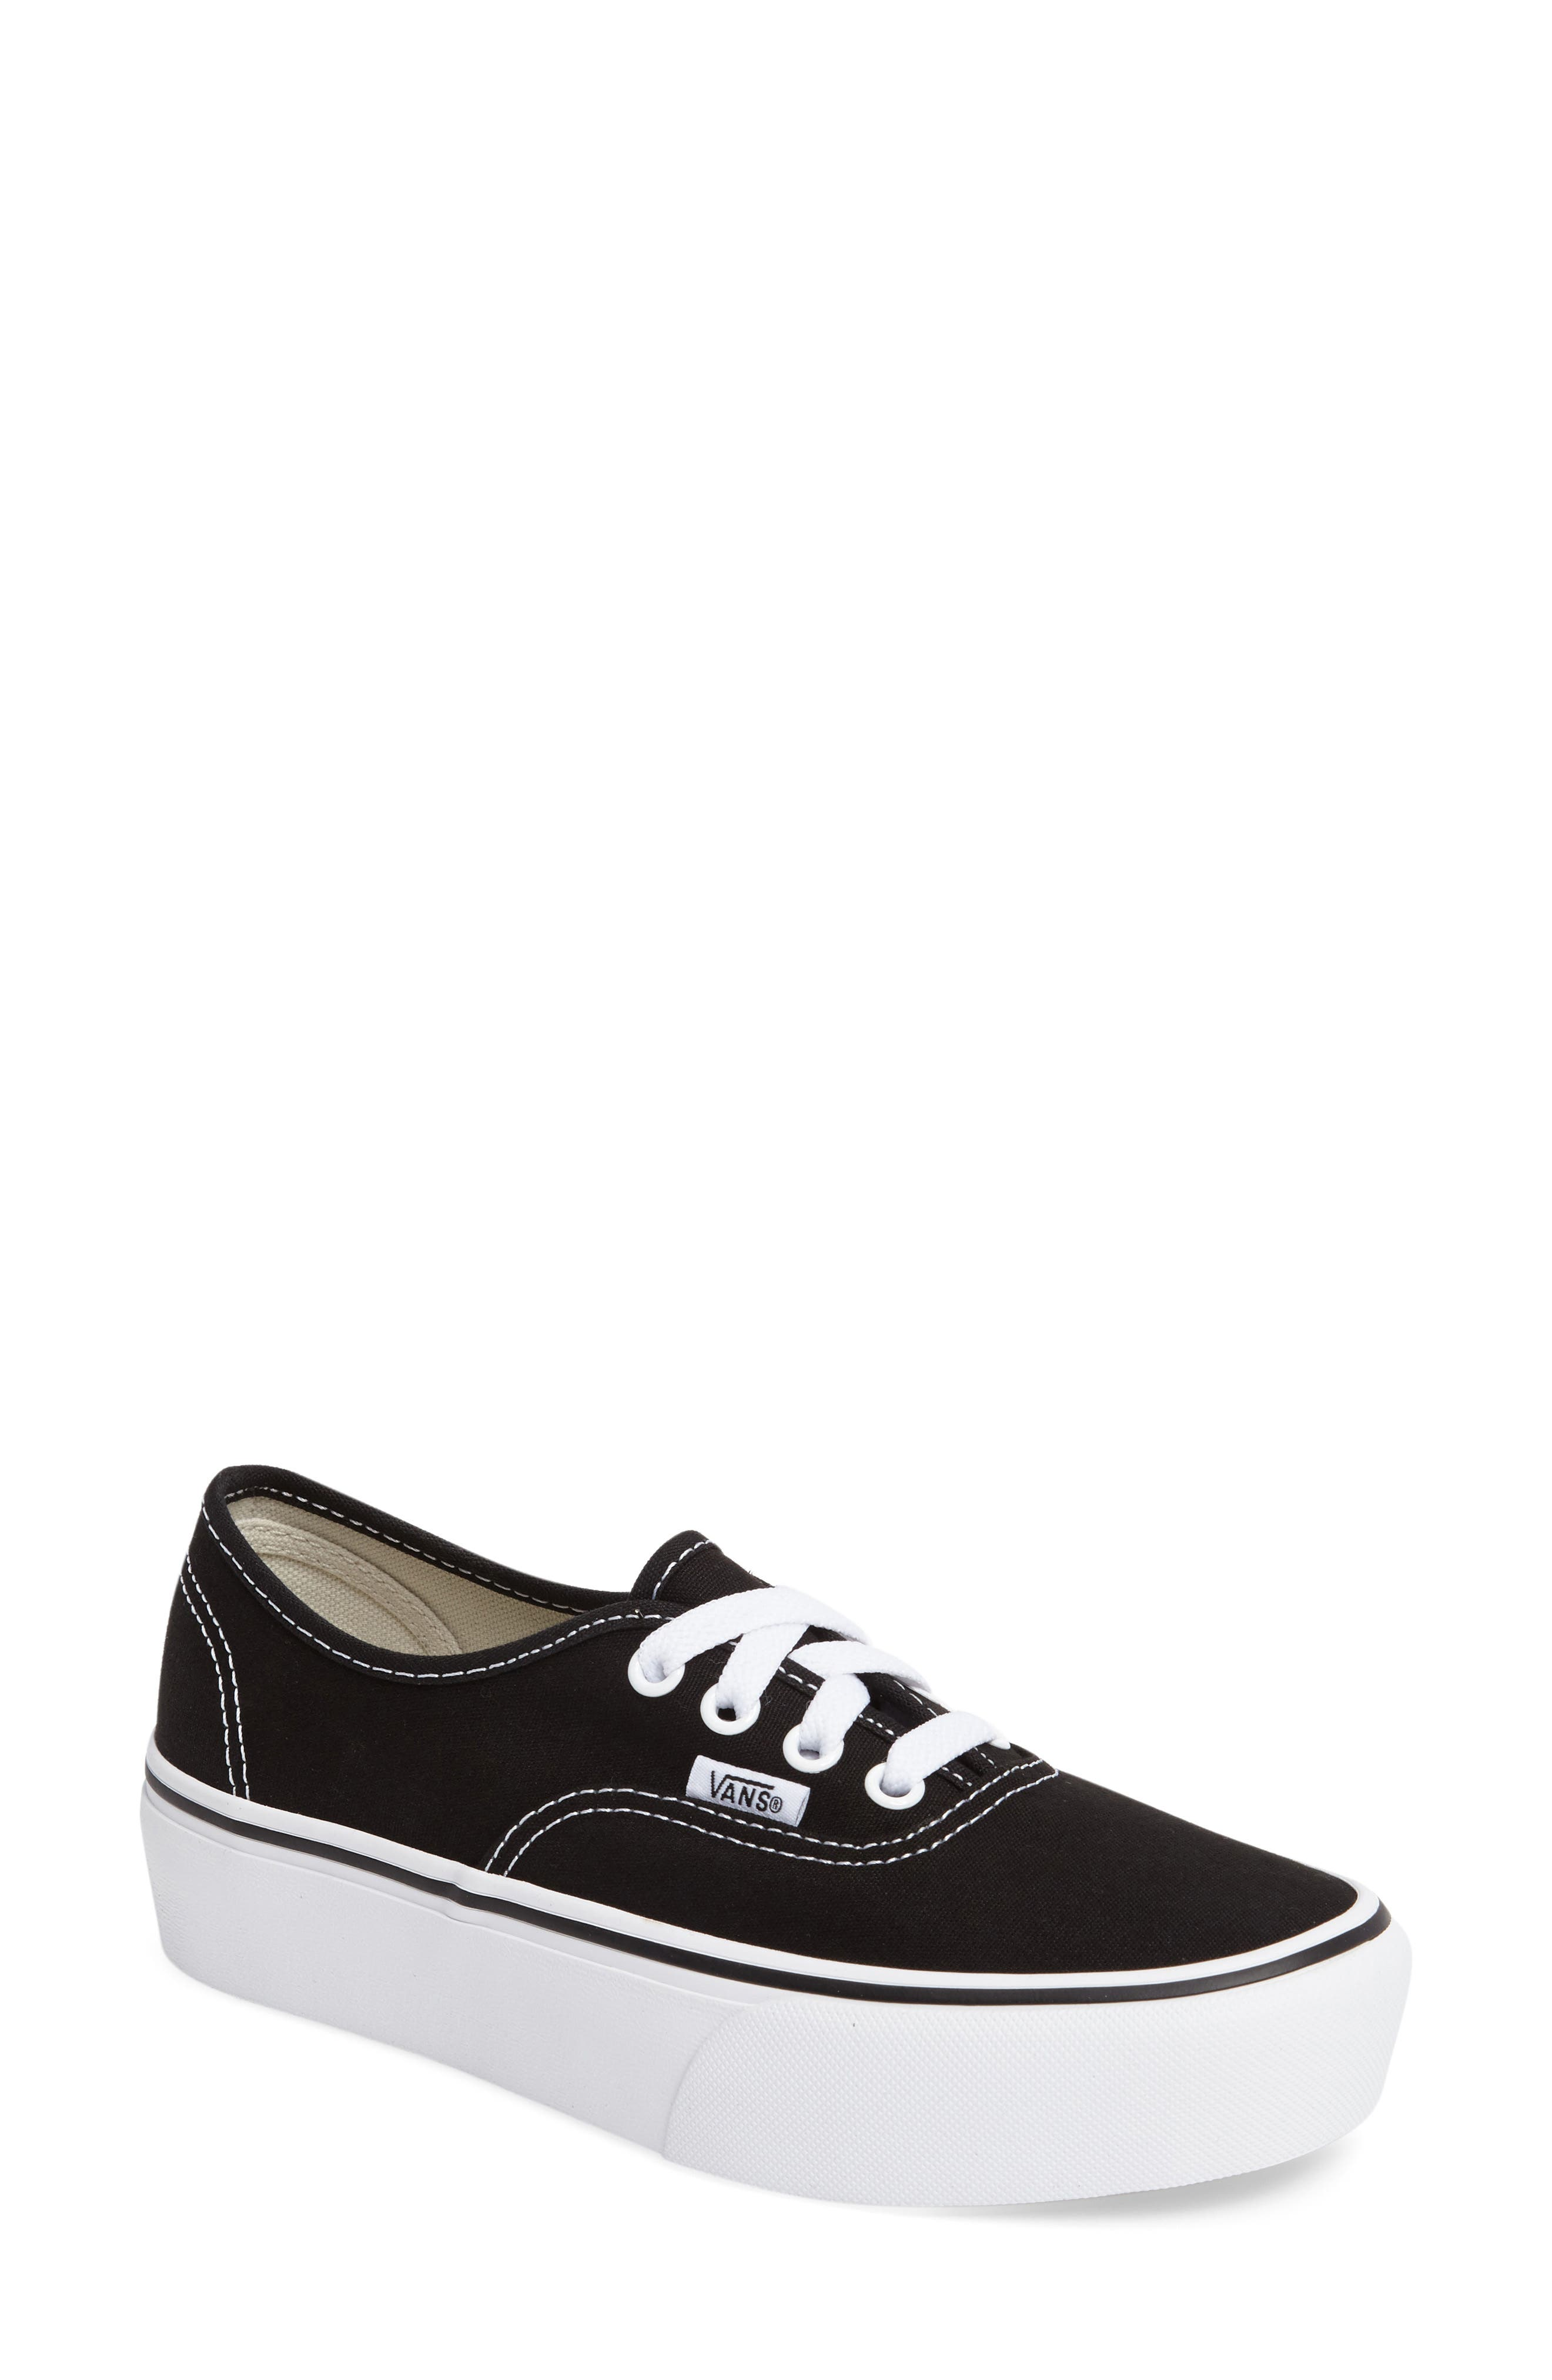 c9dc80b2aa4 ... UPC 190850300174 product image for Women s Vans  Authentic  Platform  Sneaker